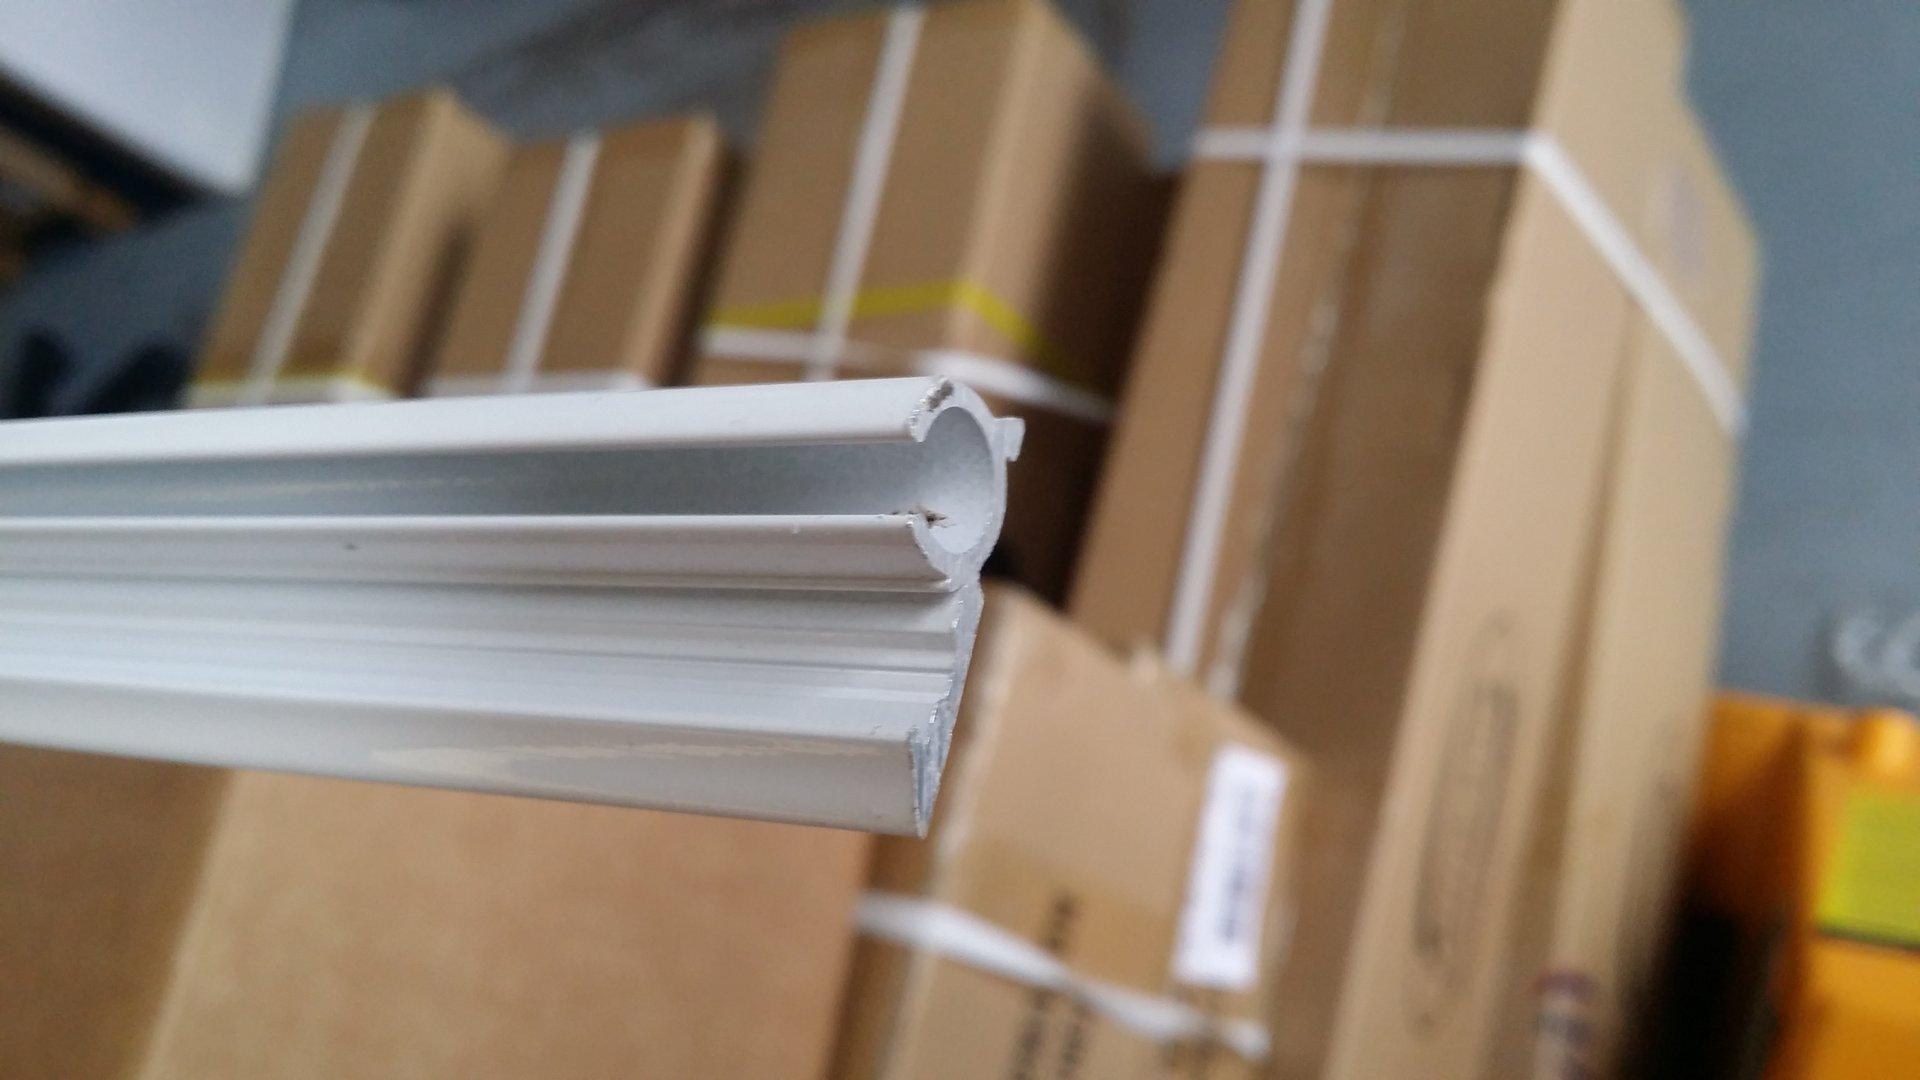 Guia aluminio blanco perfil para avance toldilla barra 3 for Guia aluminio para toldo